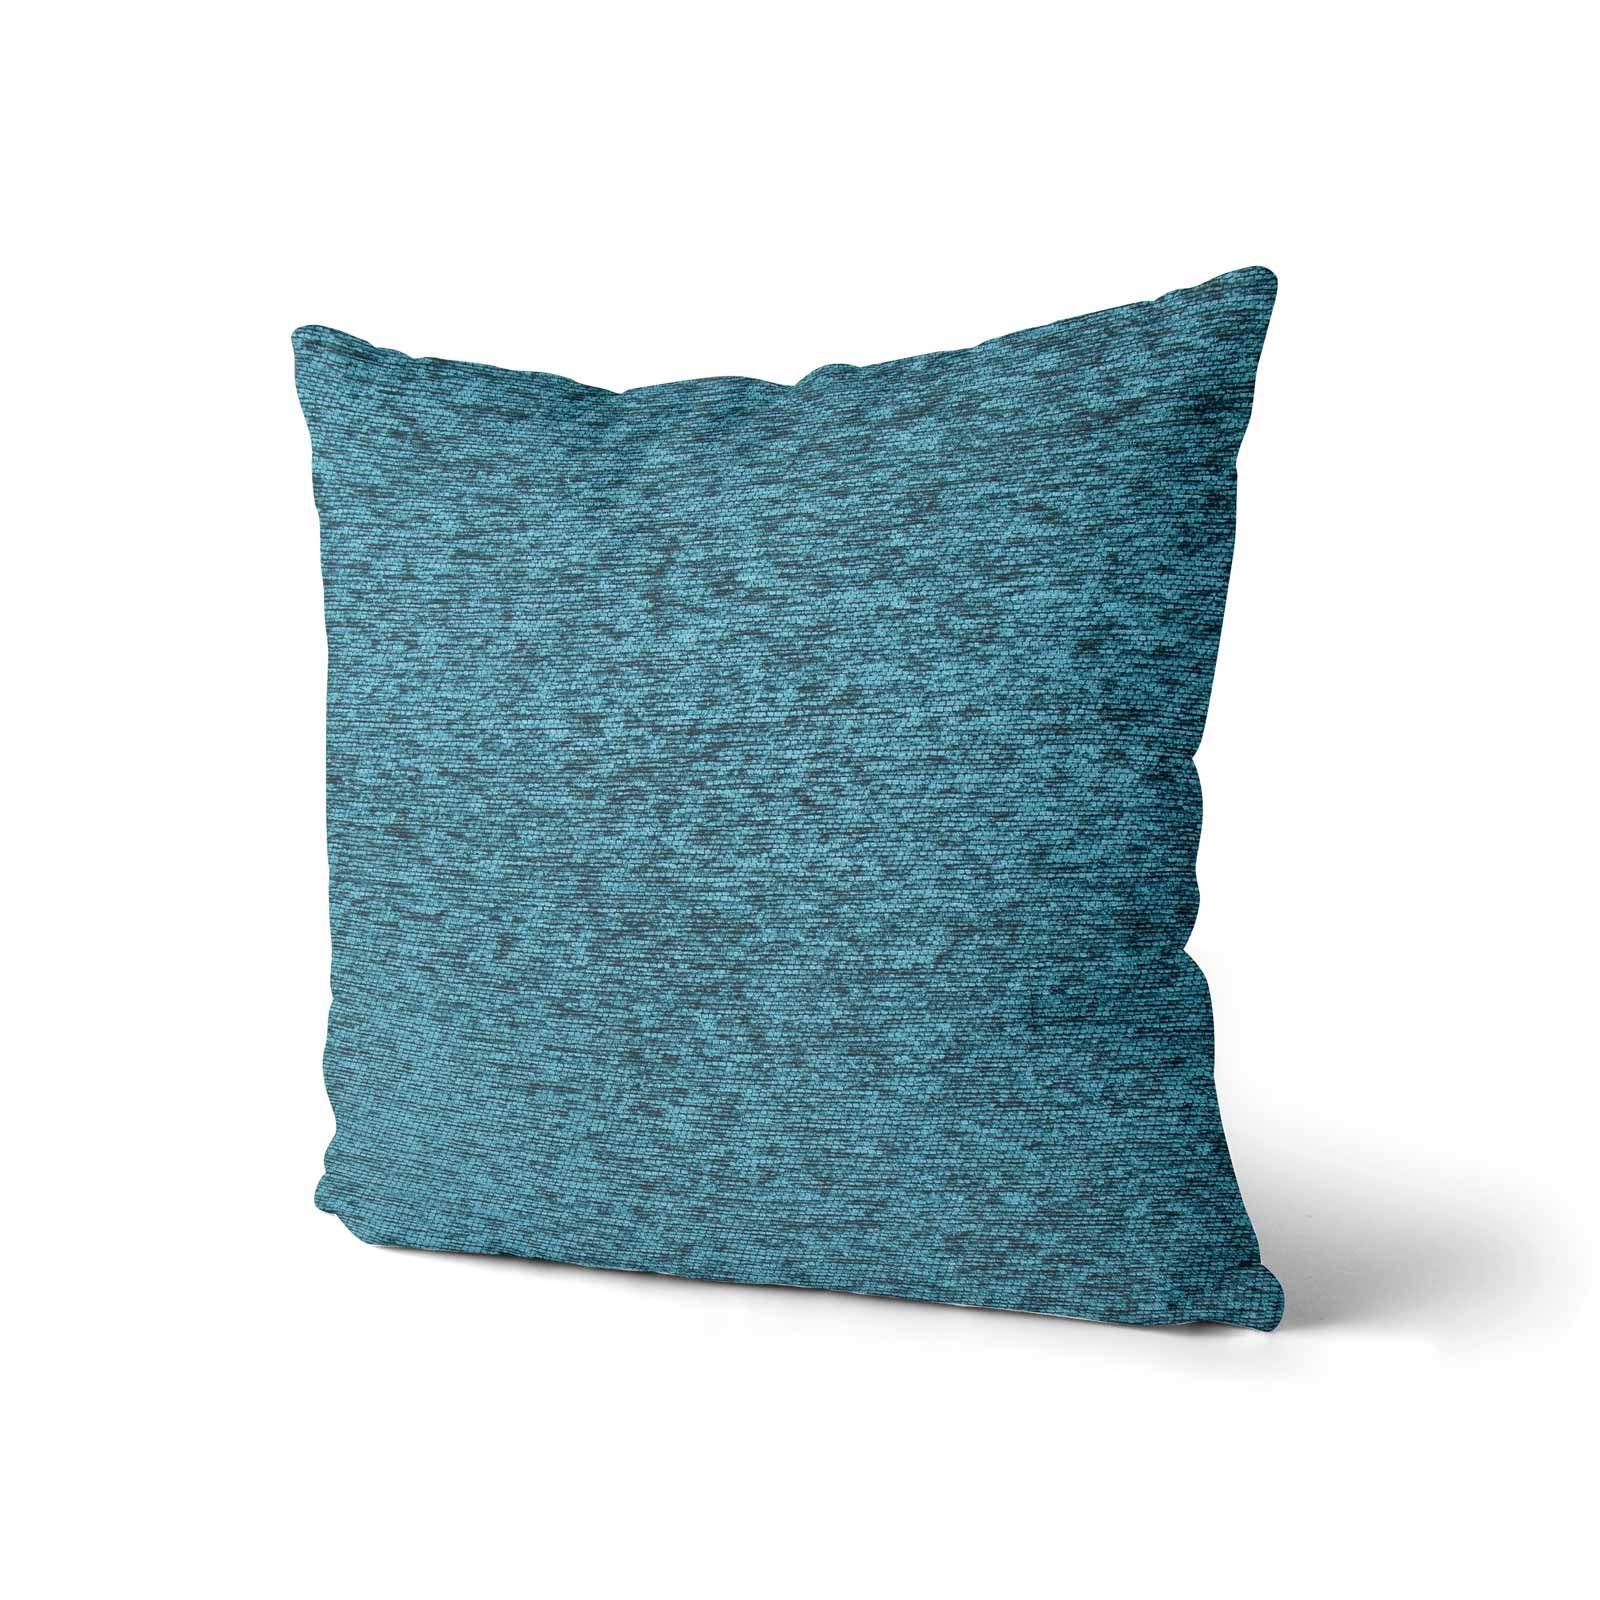 Teal-Blue-Duck-Egg-Cushion-Covers-18-034-x18-034-45cm-x-45cm-Luxury-Cover thumbnail 29